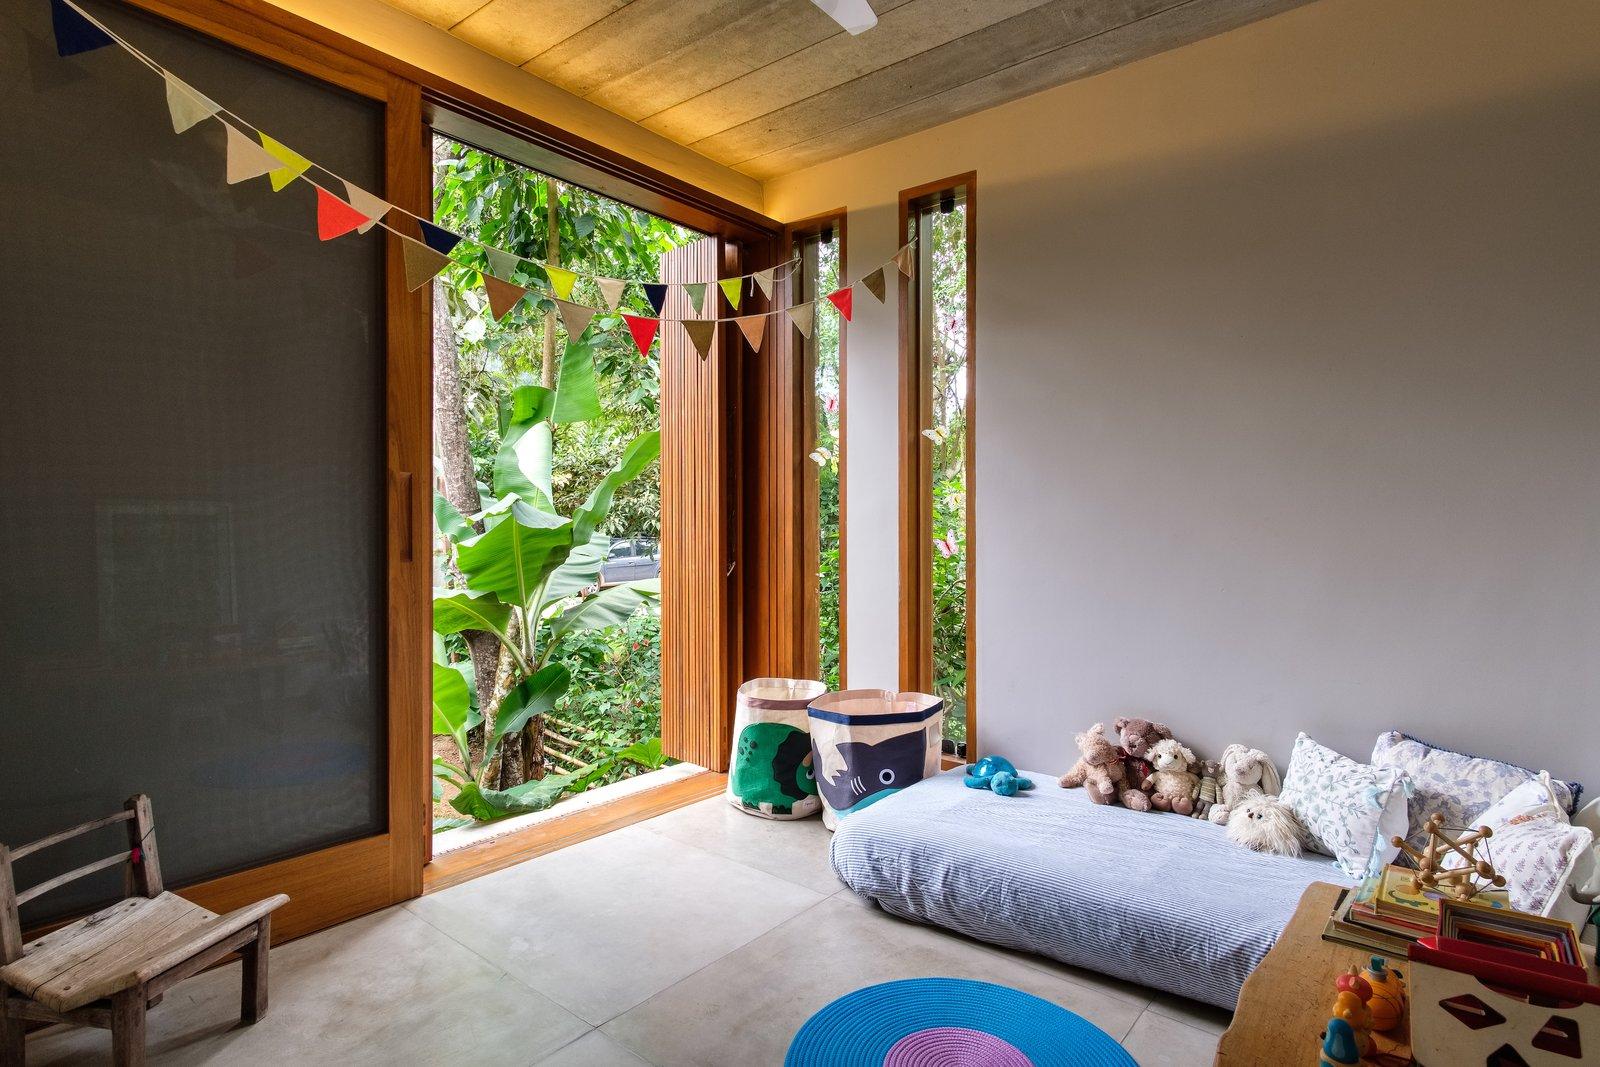 Casa Modelo bedroom